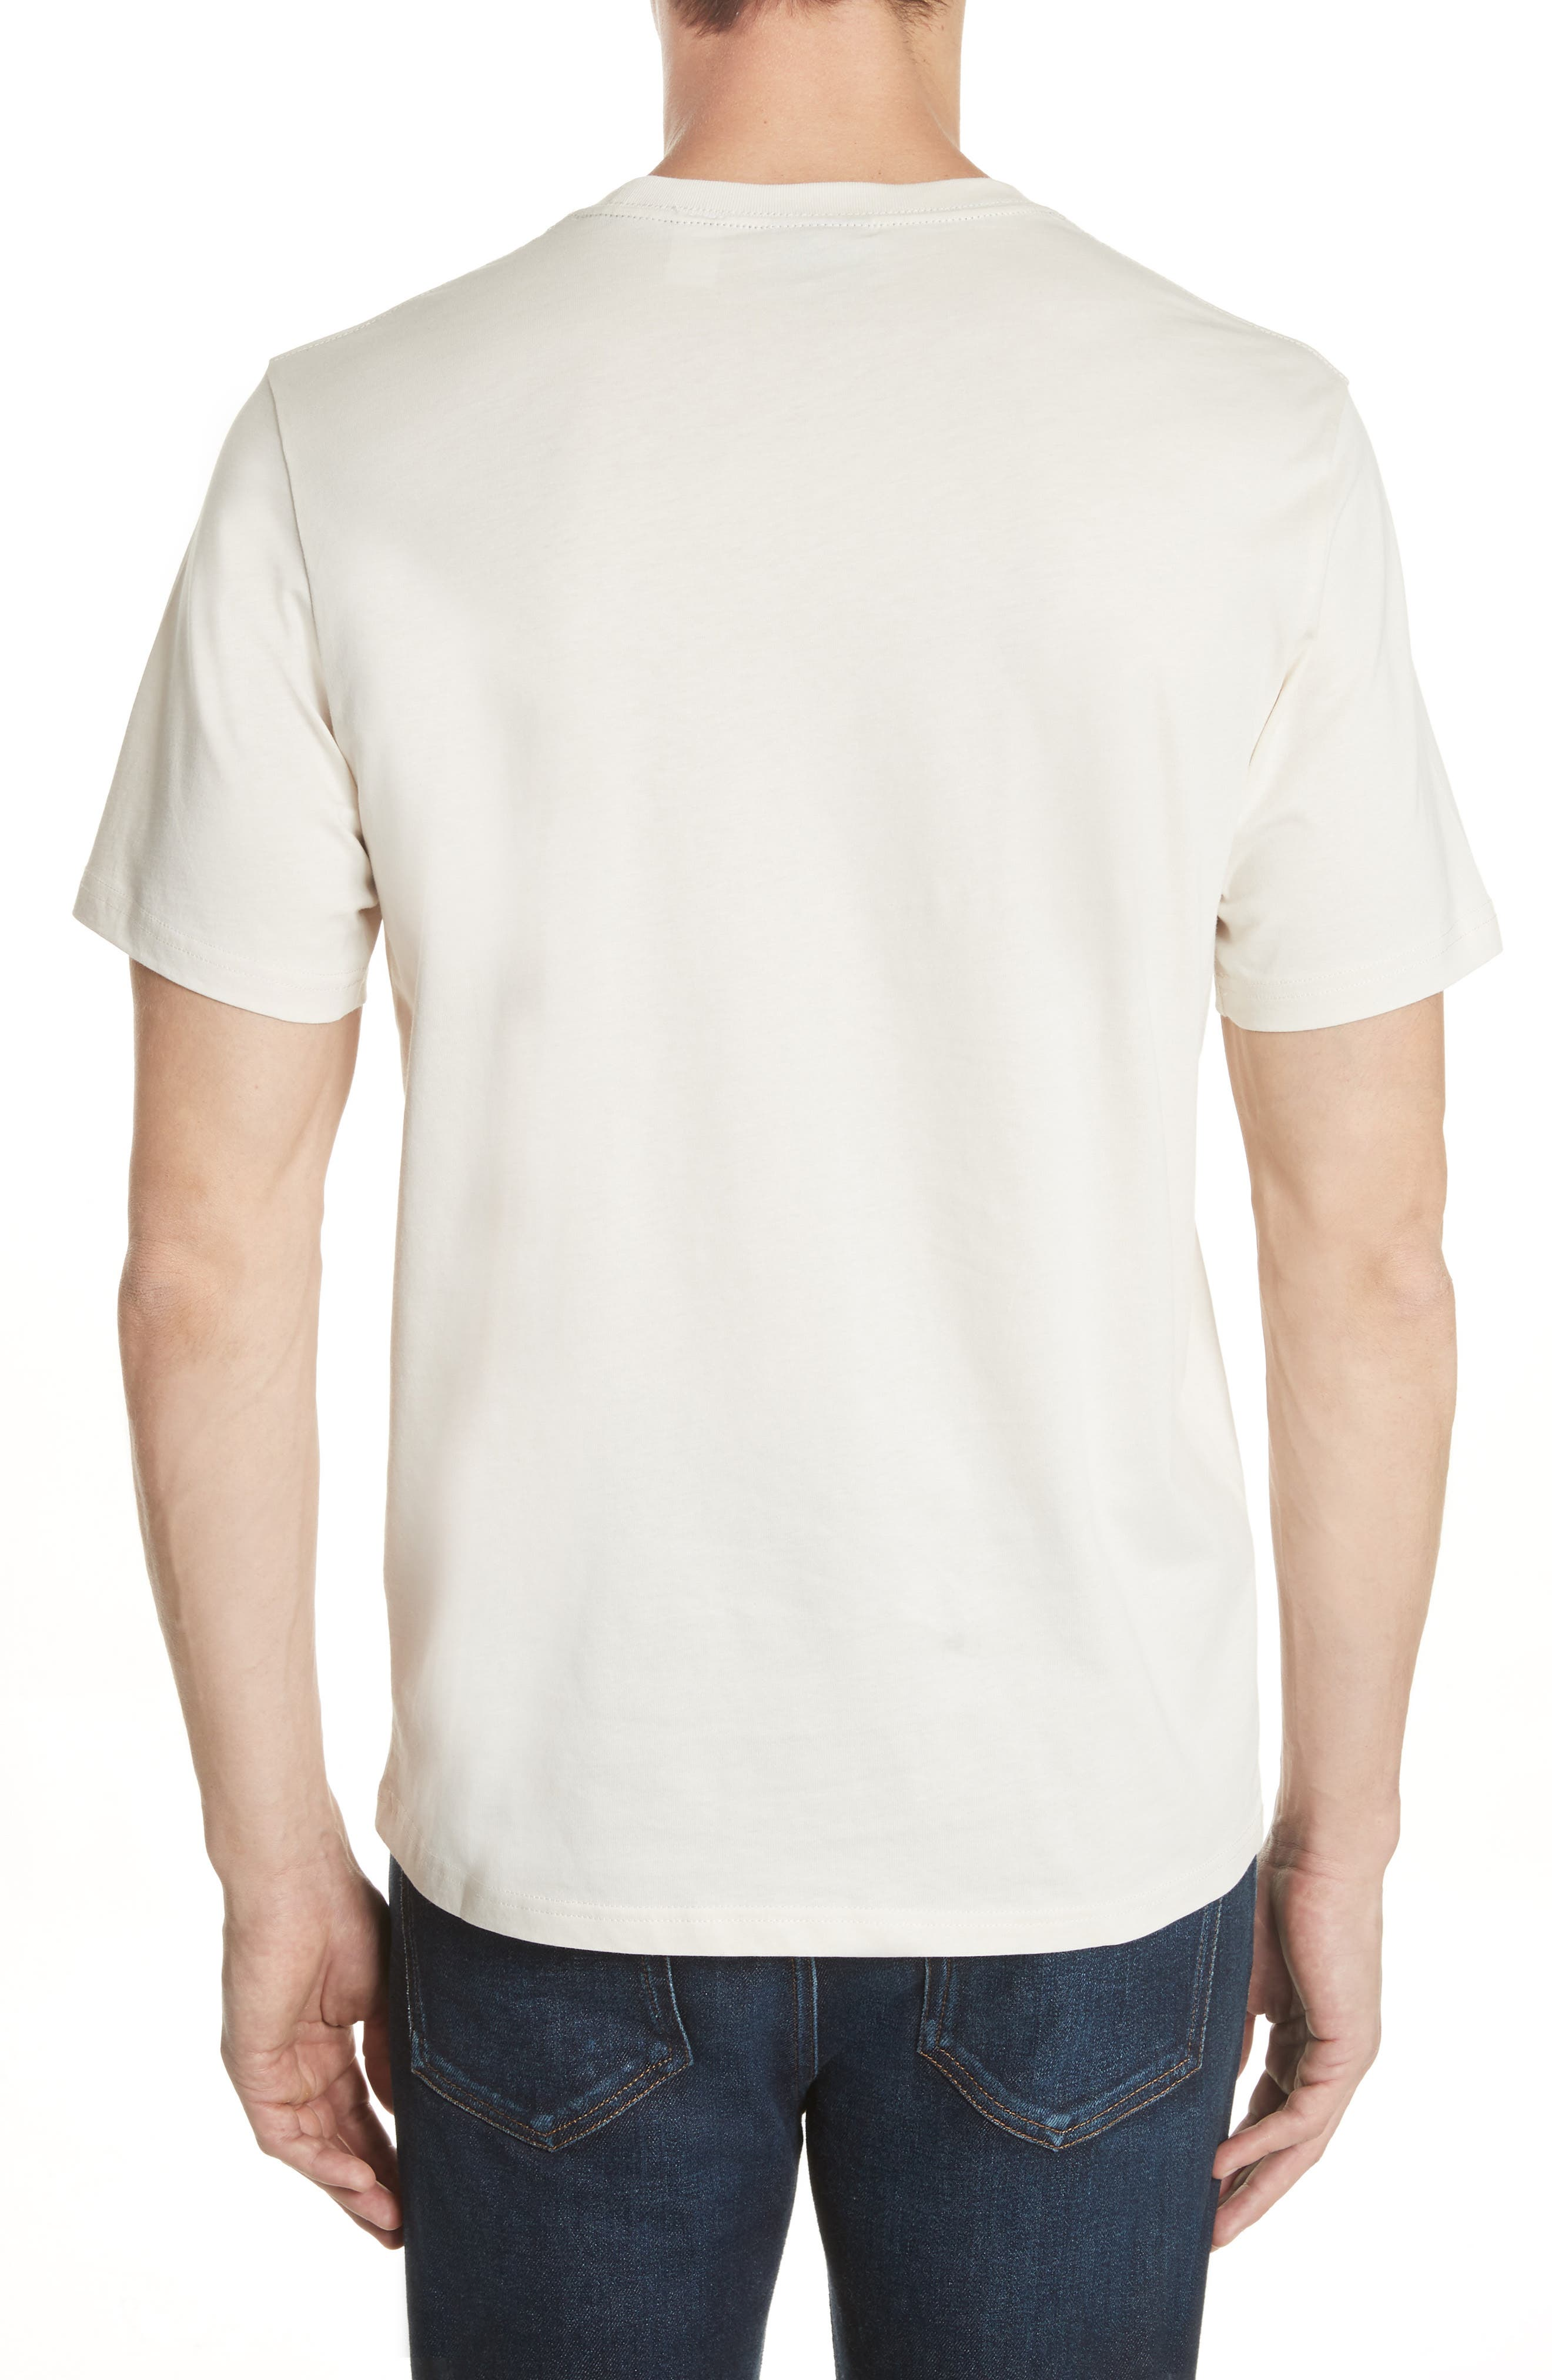 Kyoto Graphic T-Shirt,                             Alternate thumbnail 2, color,                             035